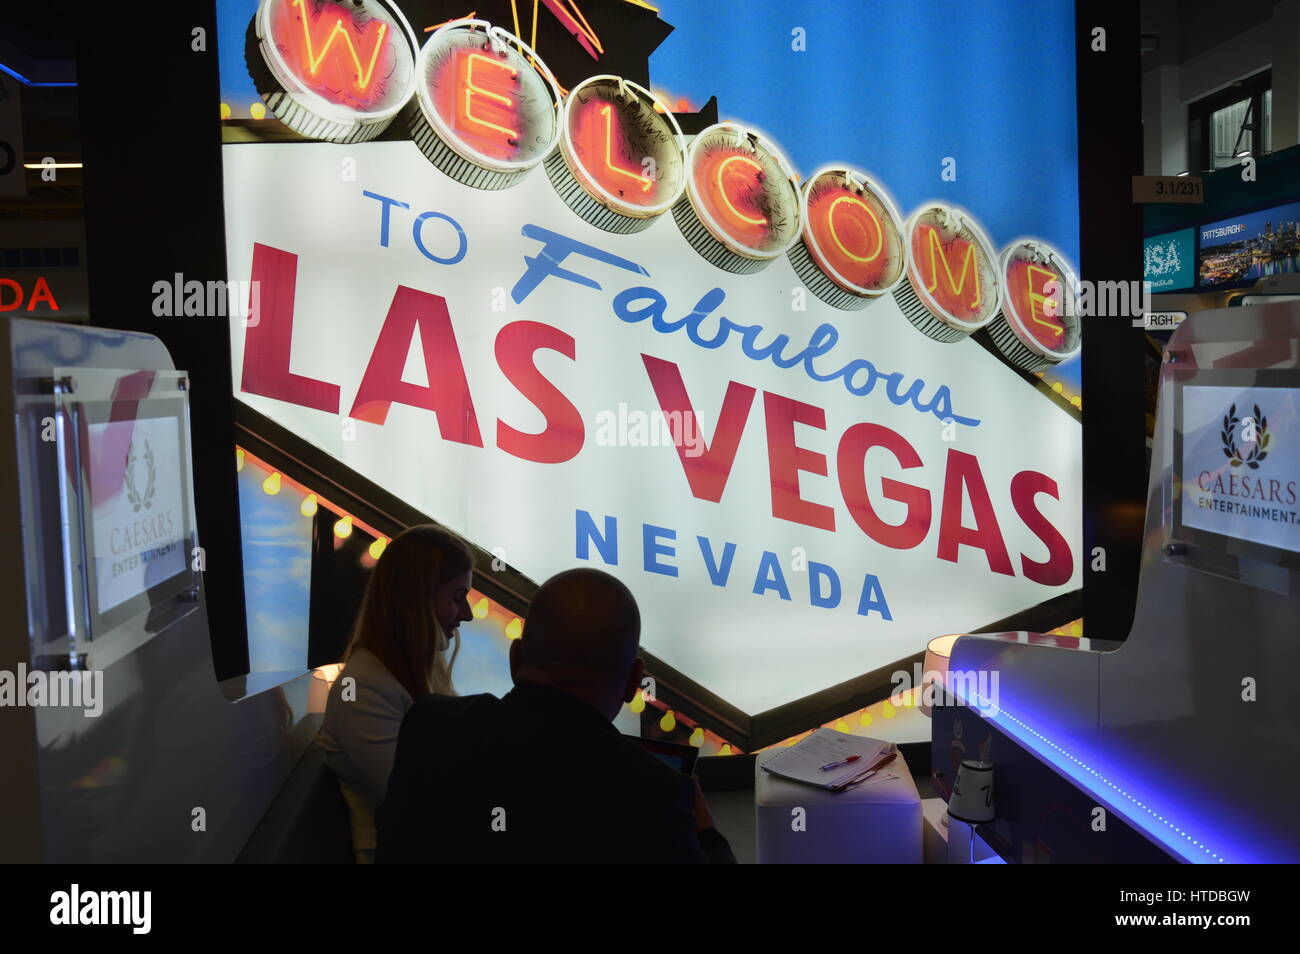 Berlin, Germany. 9th March 2017. ITB 2017 international travel trade show underway in Berlin, Germany. Las Vegas Stock Photo